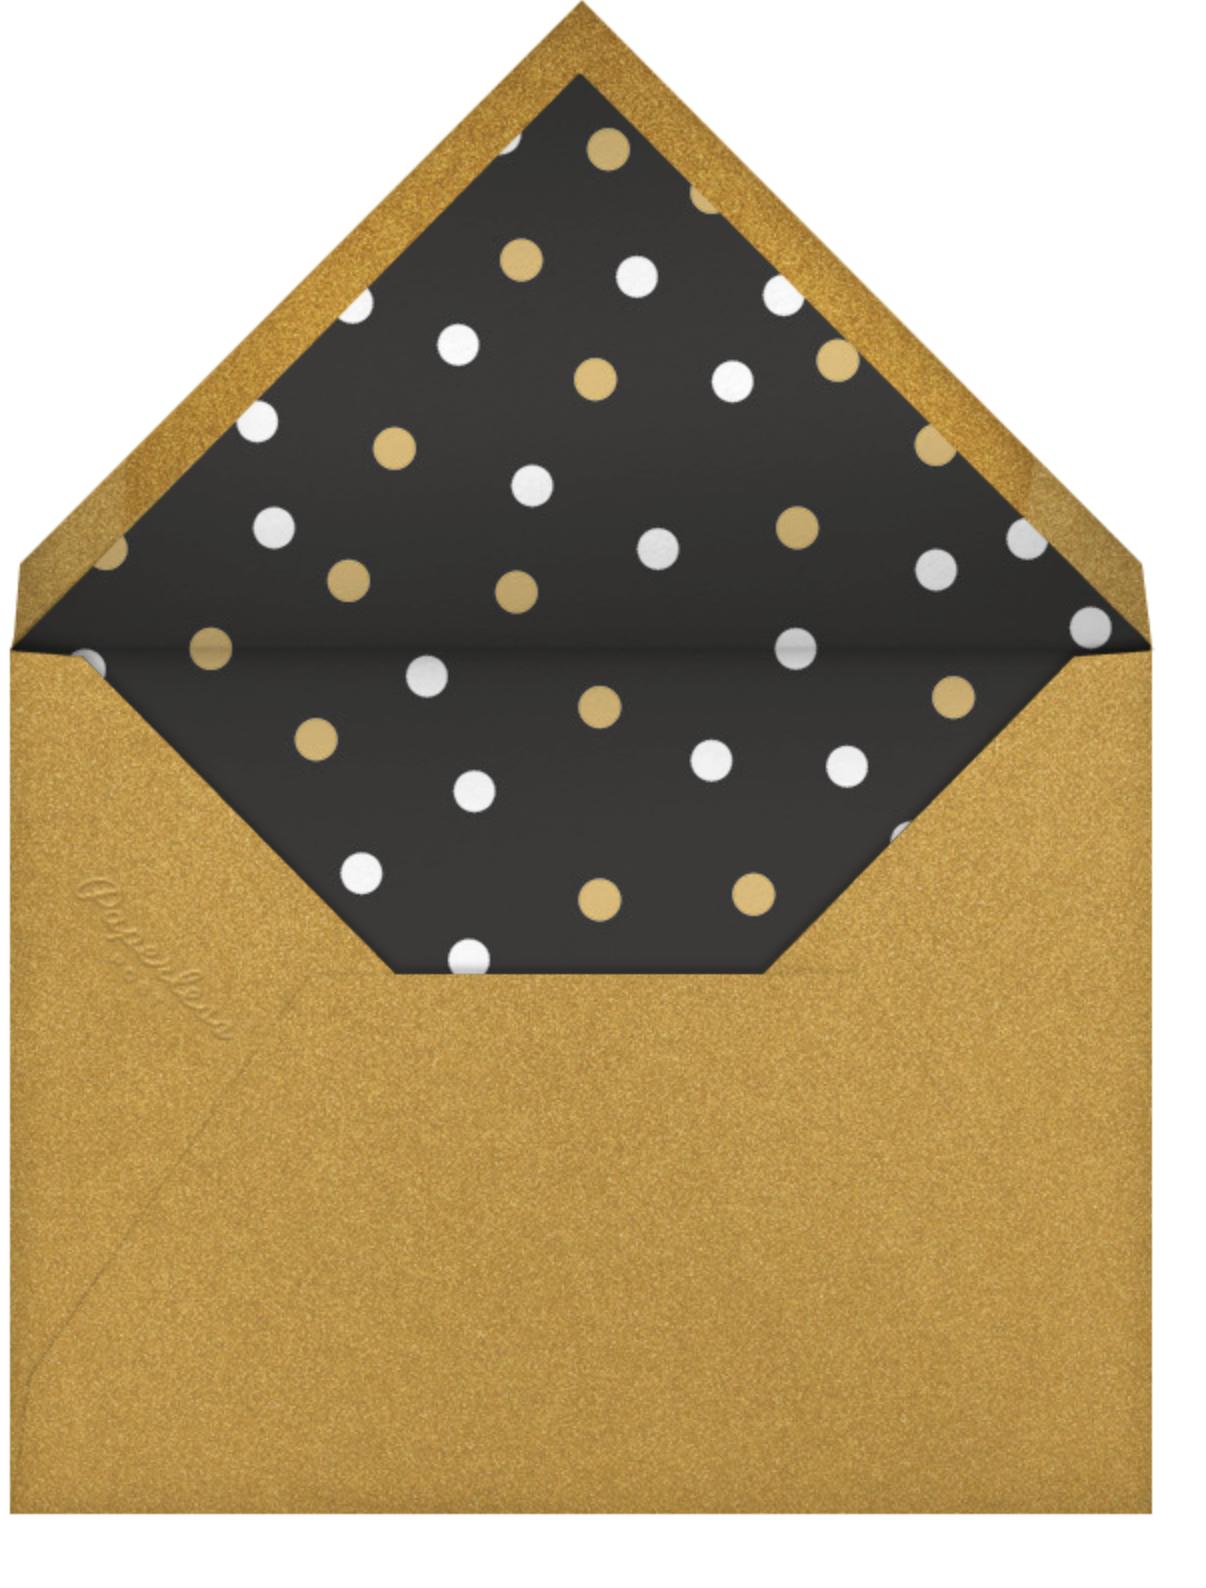 Brixton Brief Case - Black - Paperless Post - Birthday - envelope back